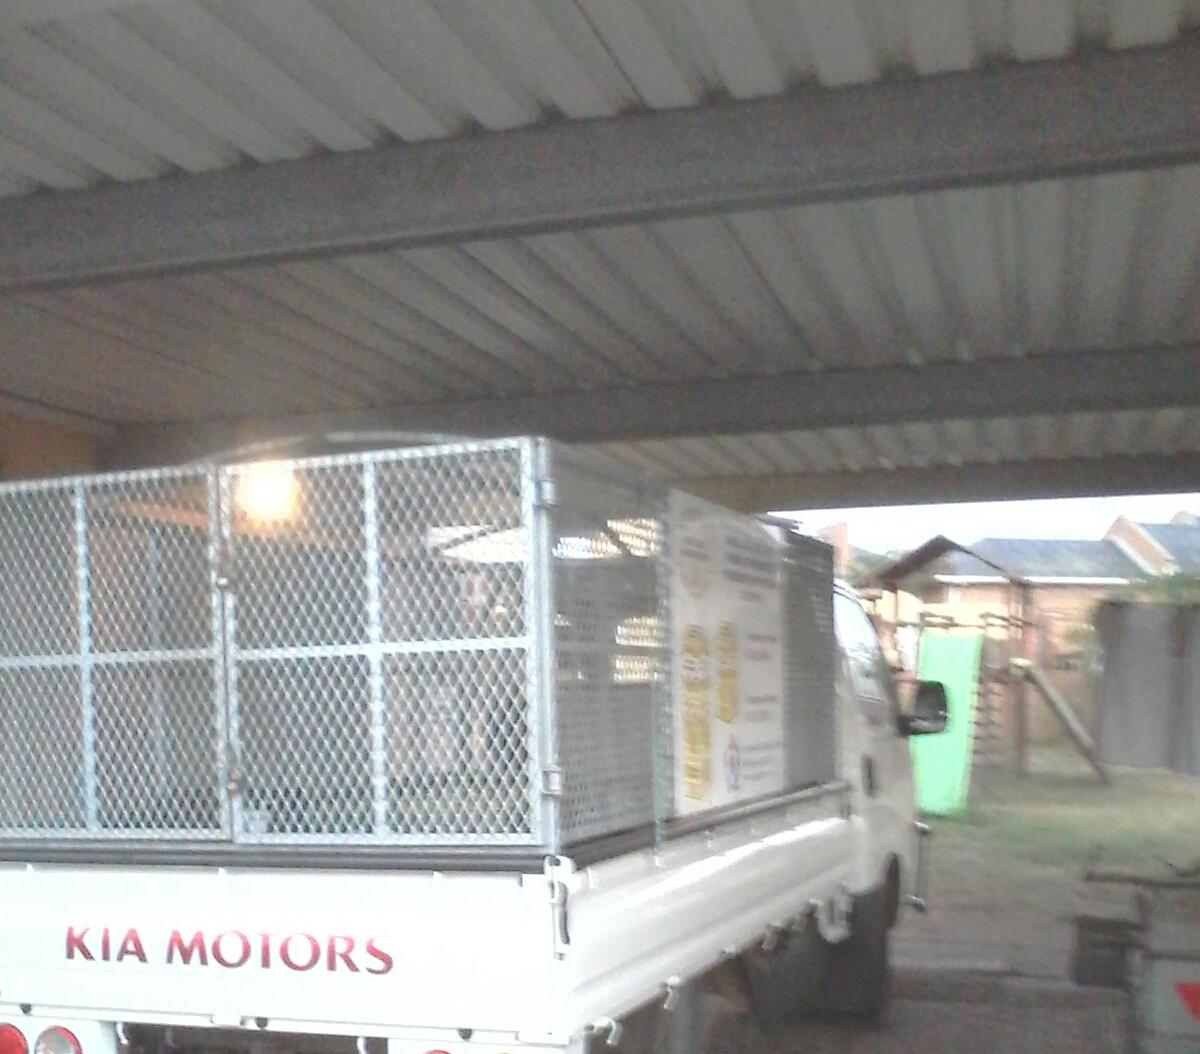 Excellent condition high volume galvanize cage for Kia k2700/ Hyundai H100 bakkie